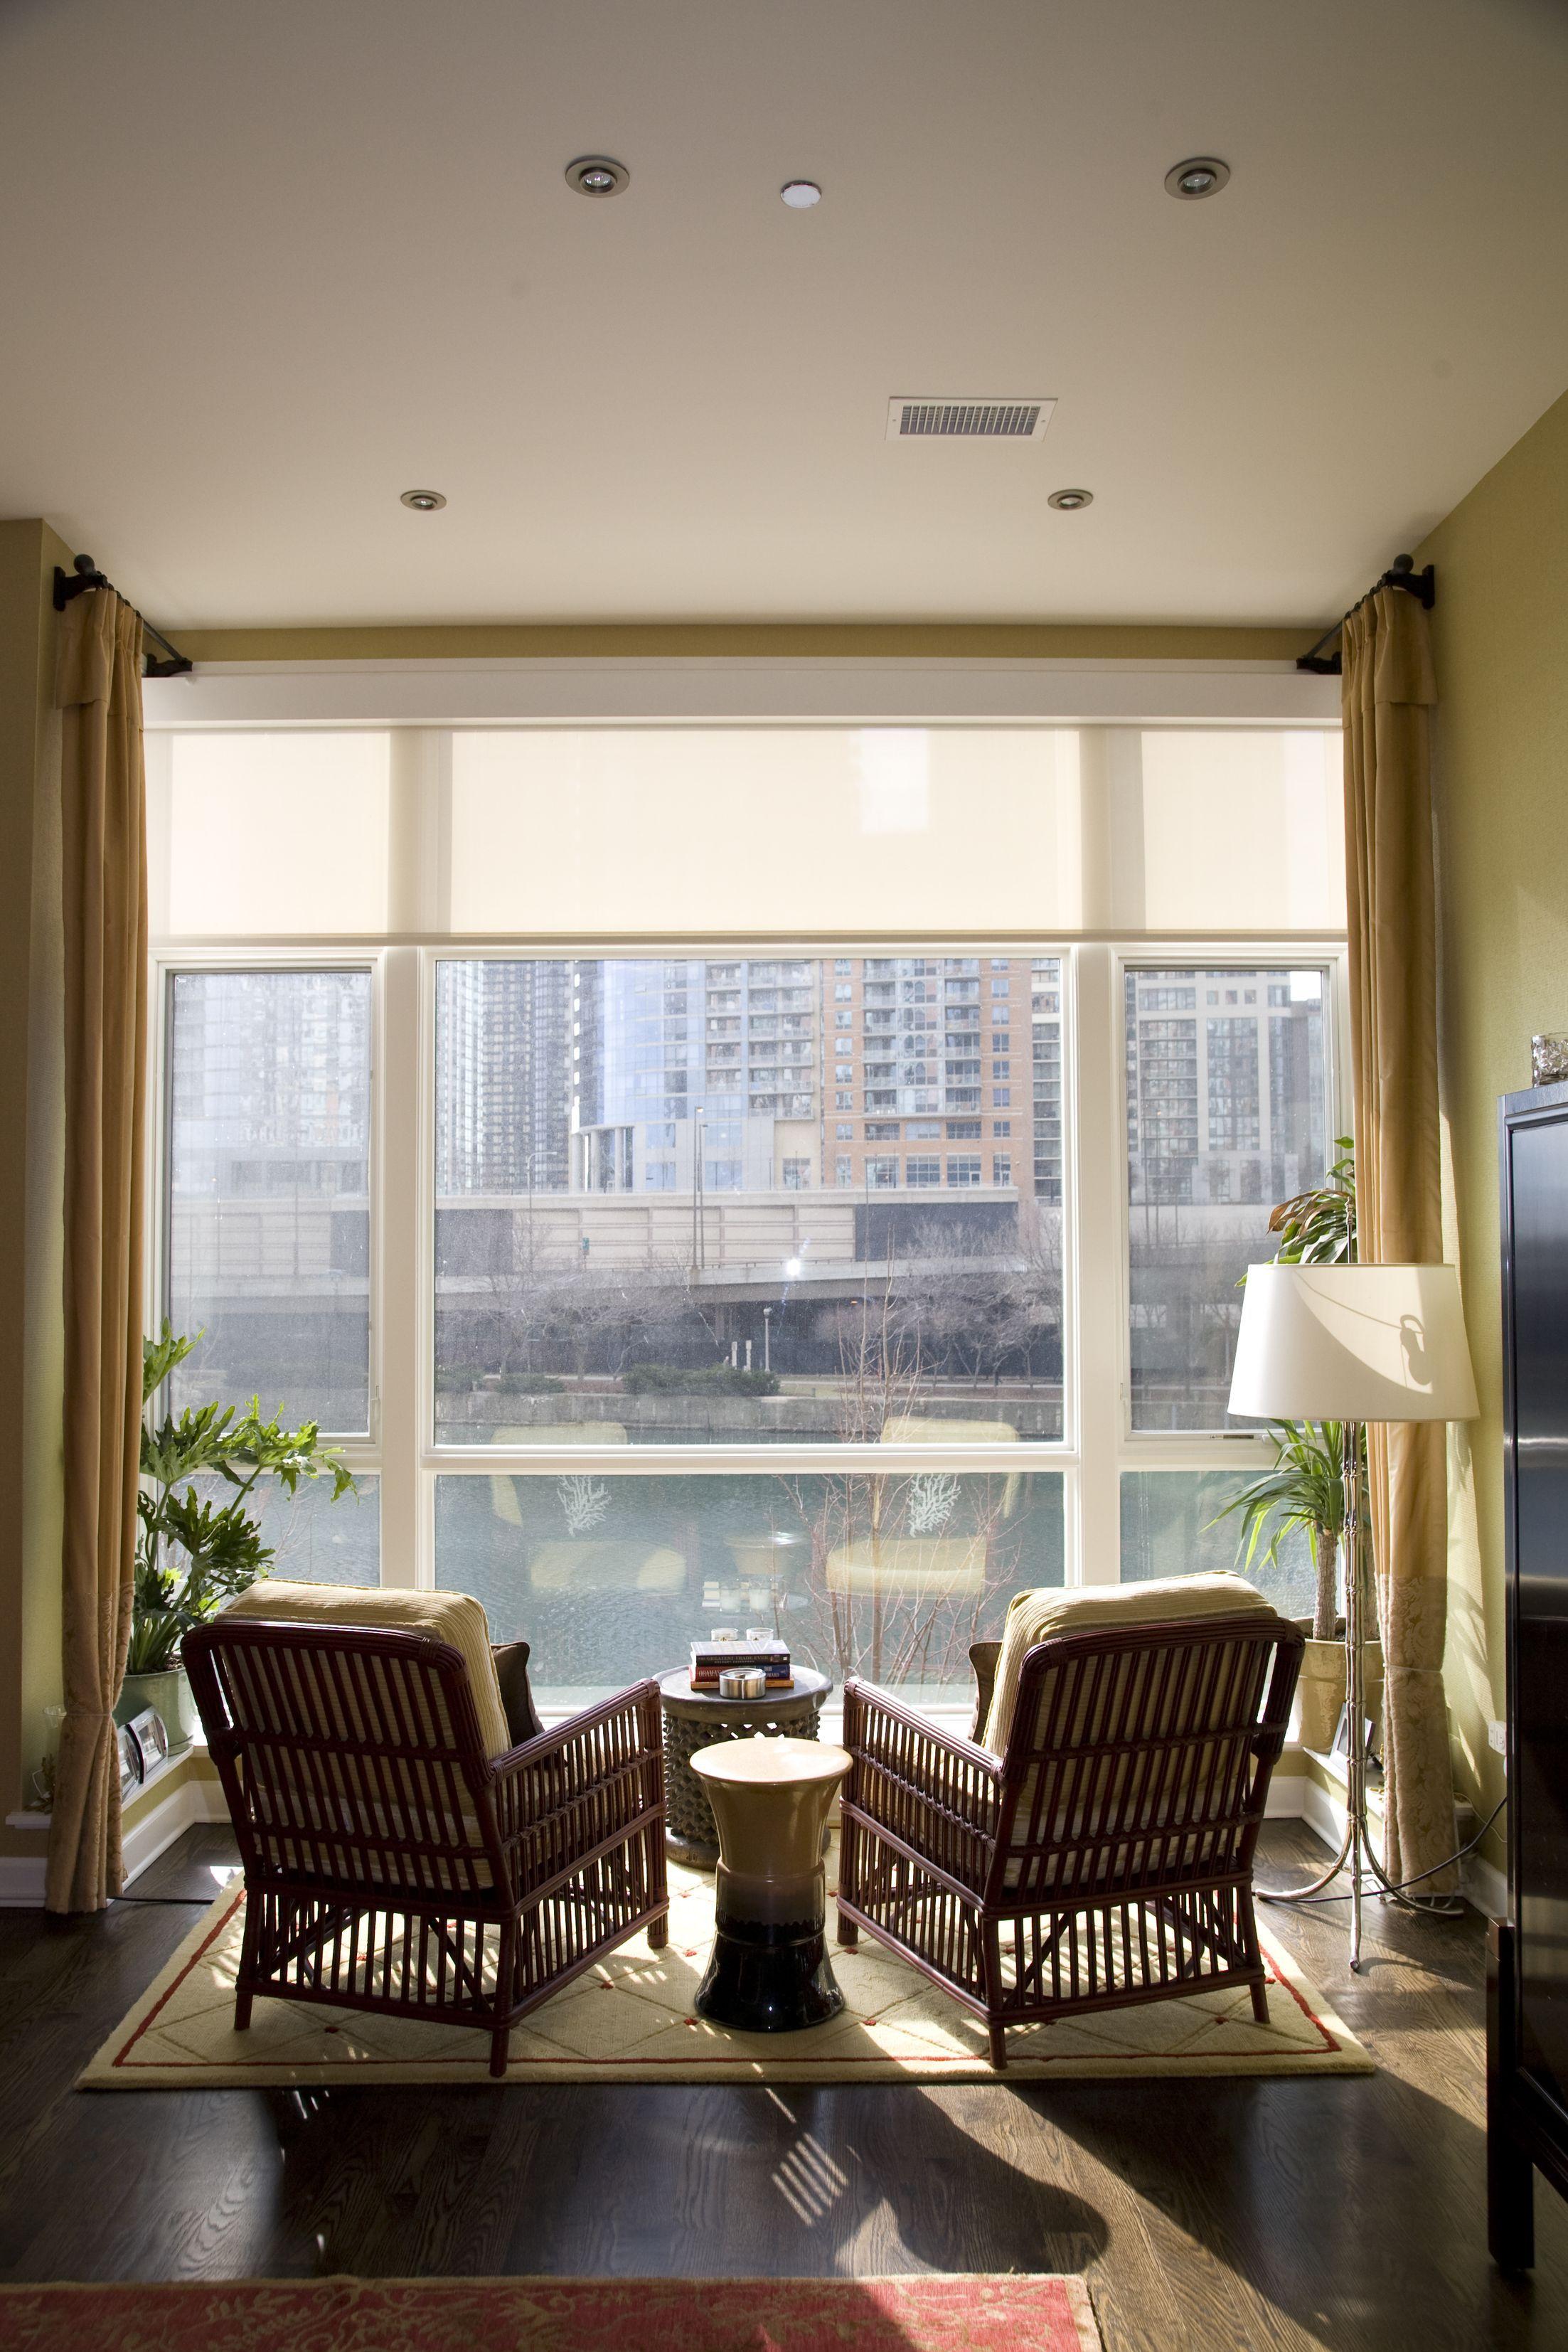 Interior Design Firm On Bedroom Designs: Master Bedroom Sitting Area